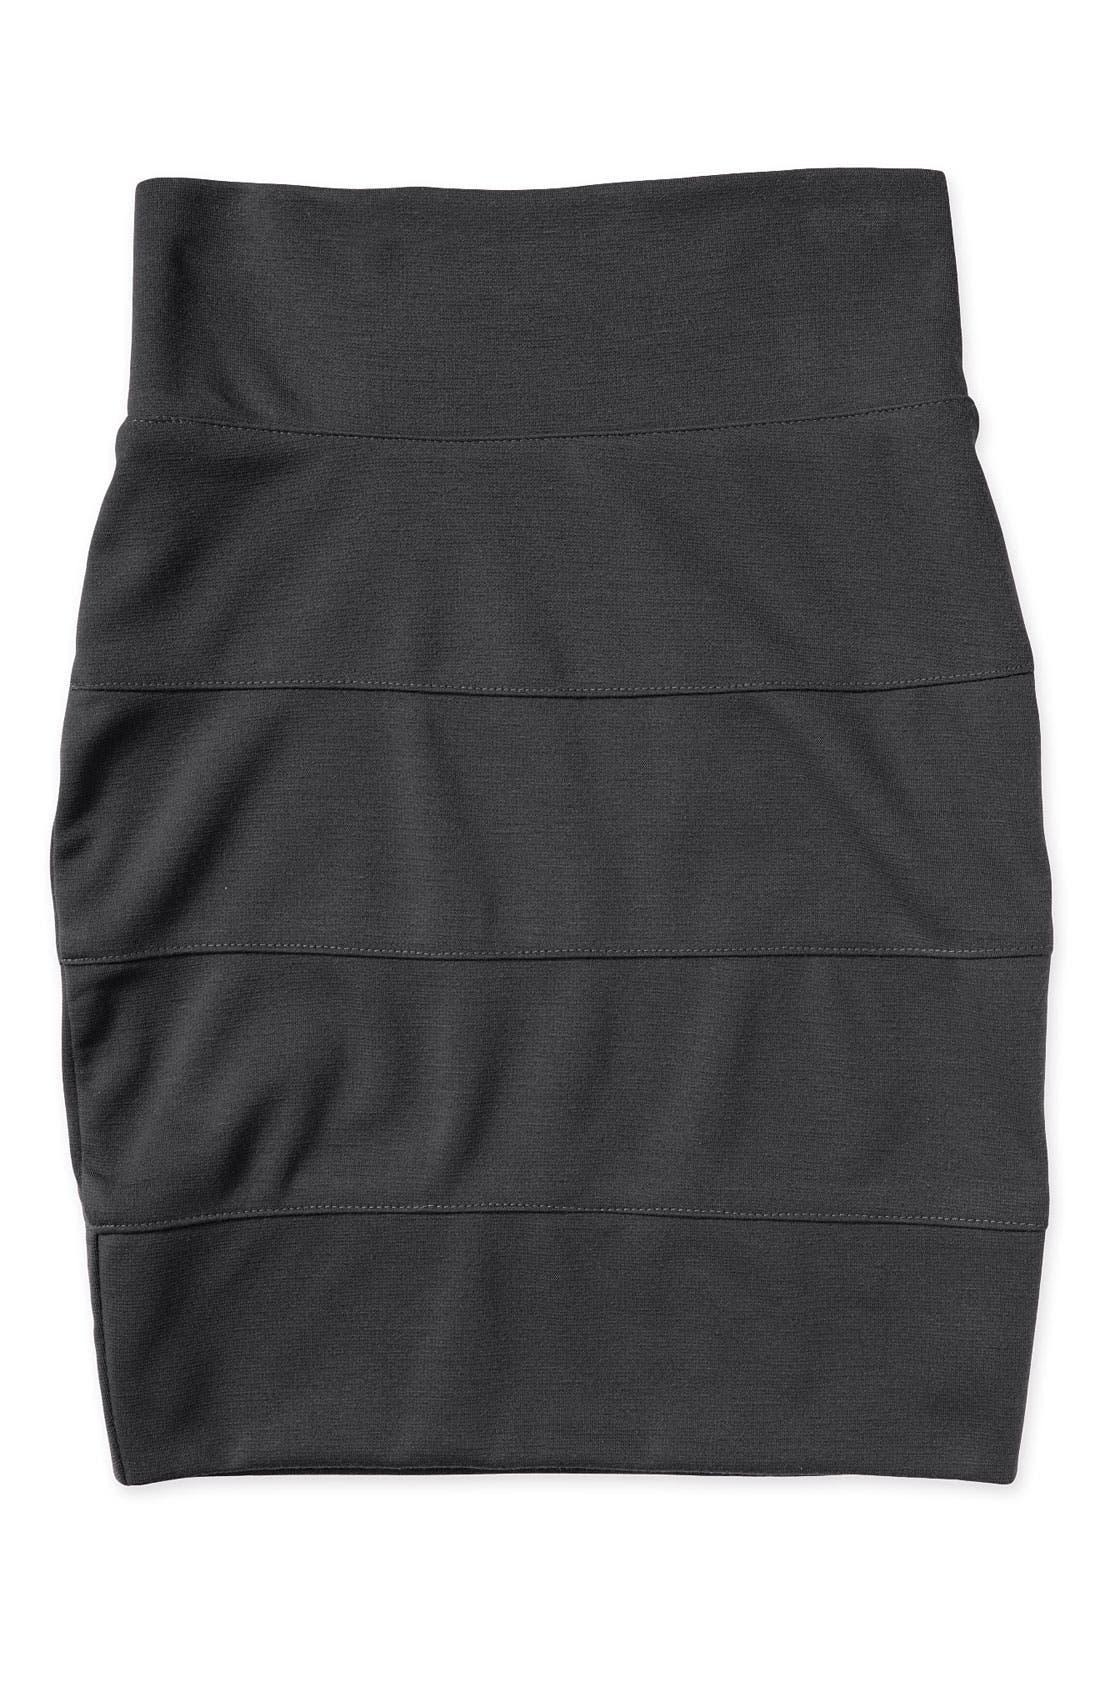 Alternate Image 1 Selected - Un Deux Trois Knit Banded Miniskirt (Big Girls)